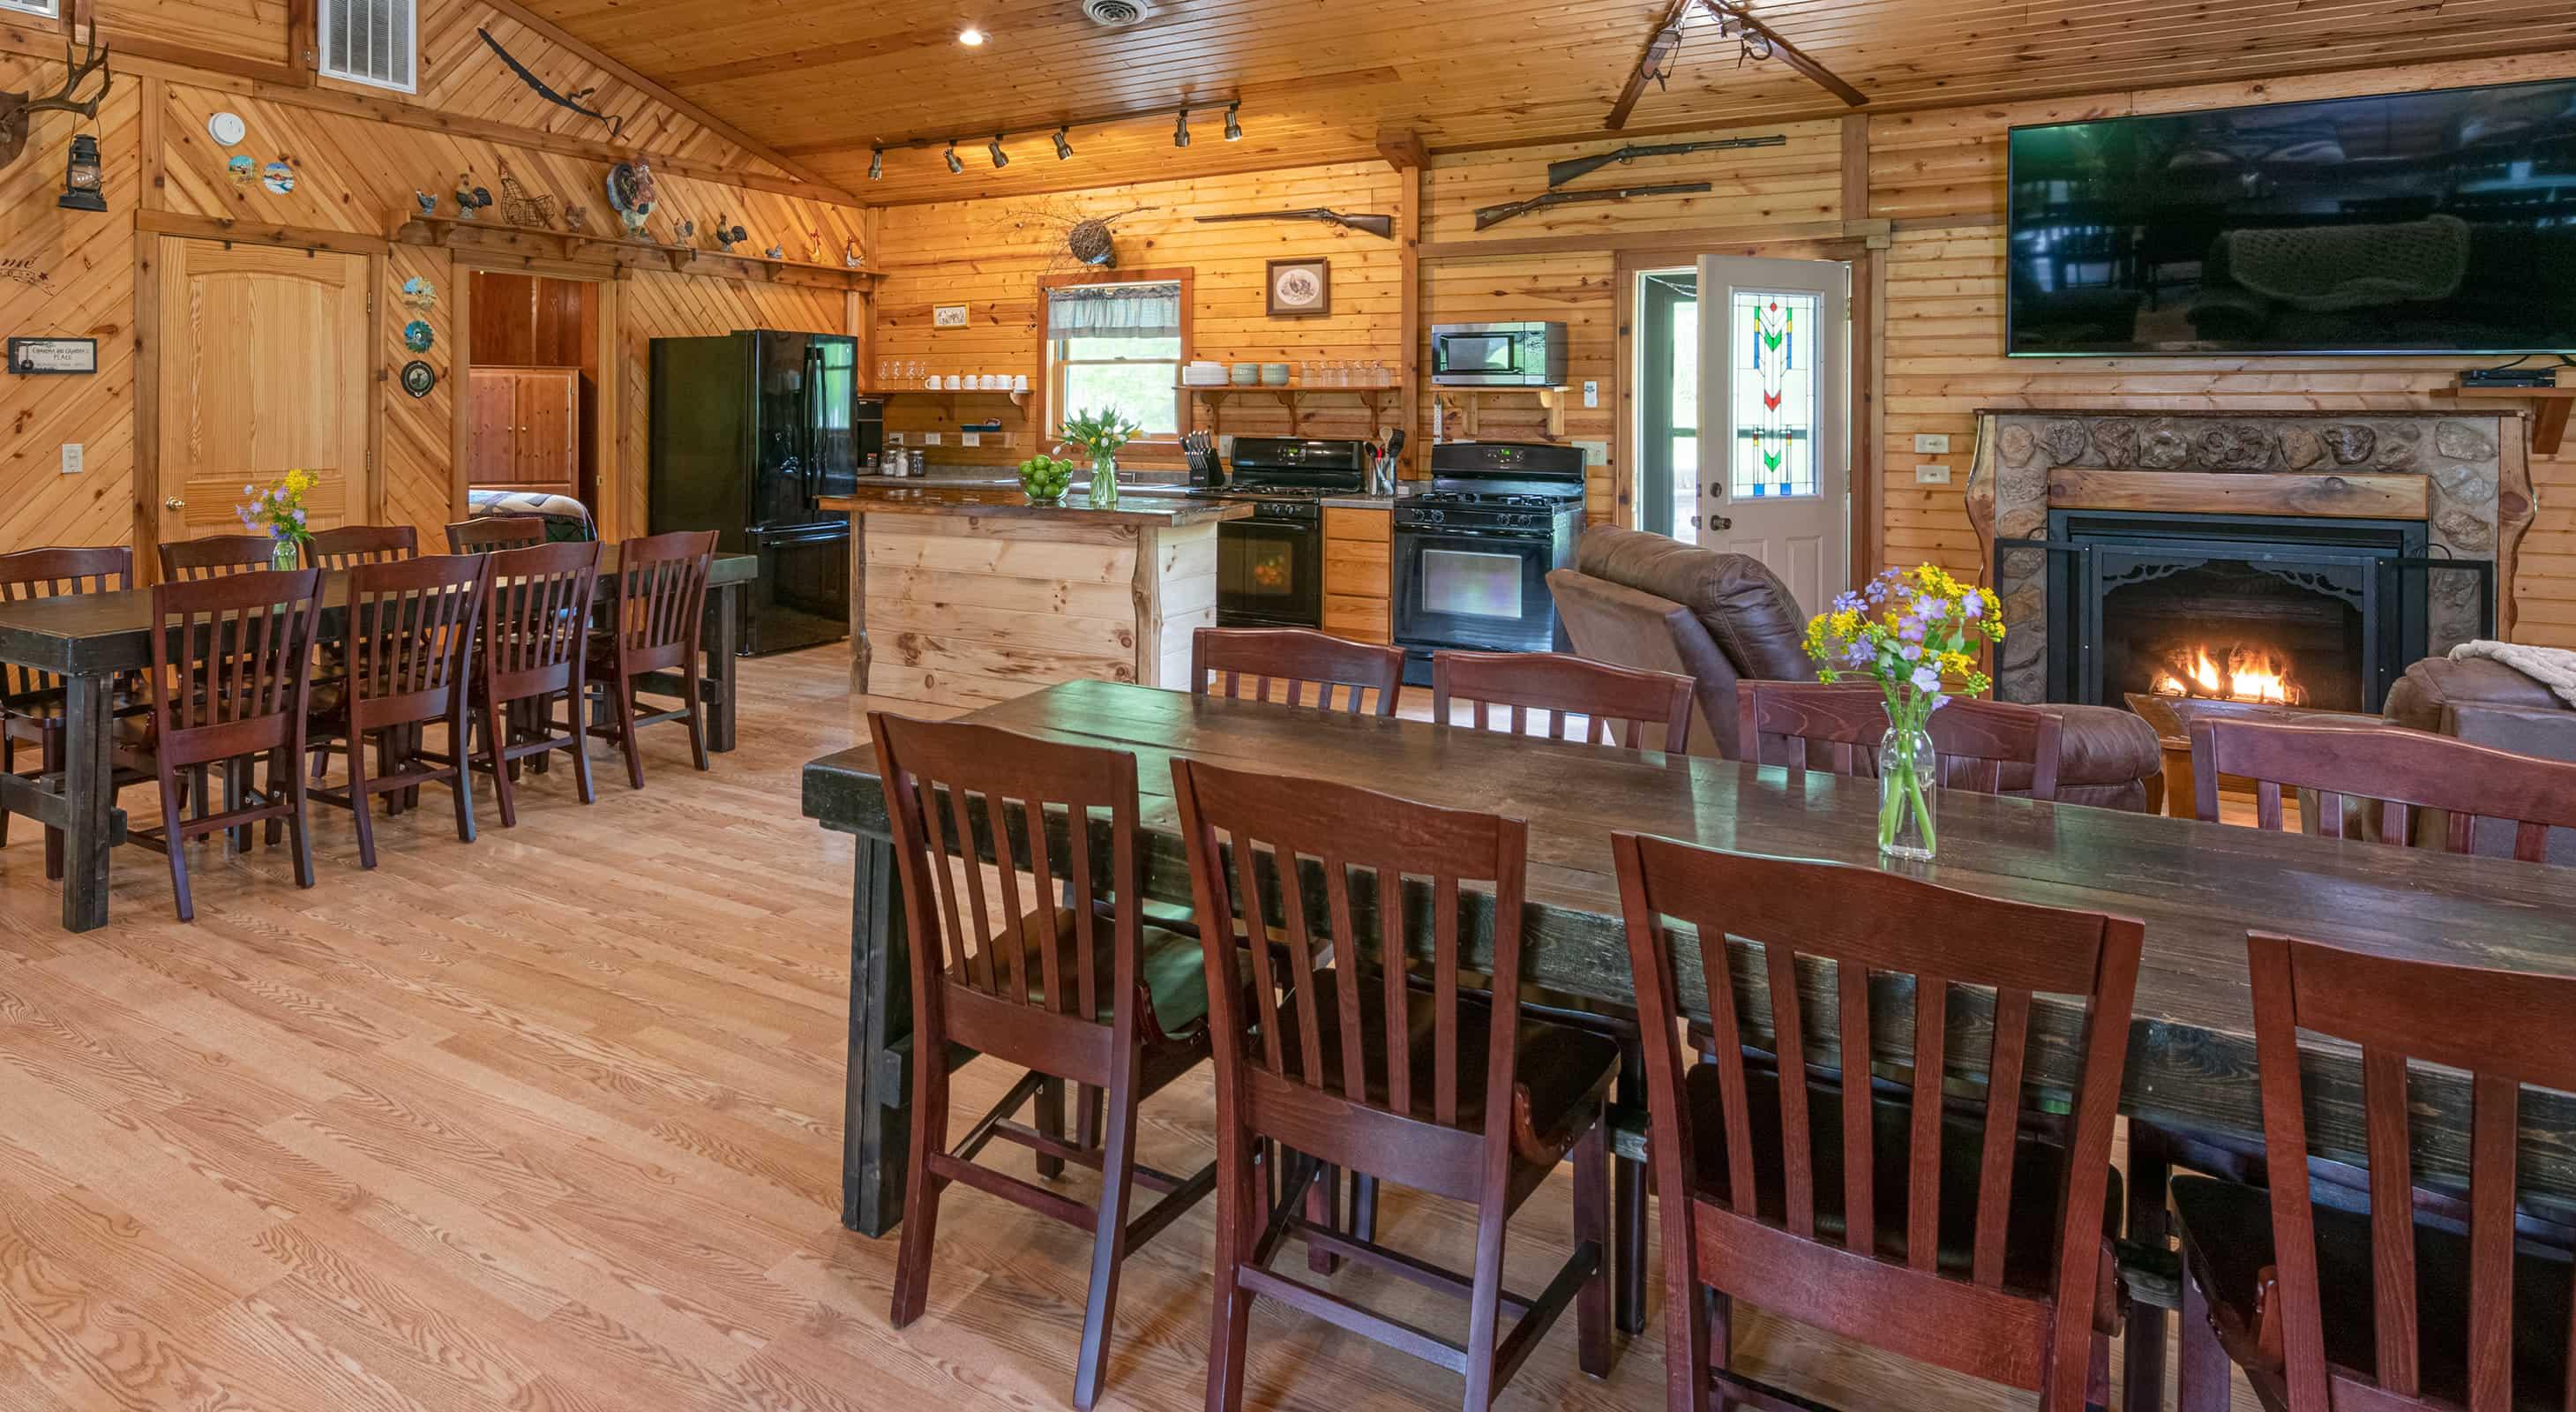 Grandma's Cabin for a family reunion near Chicago